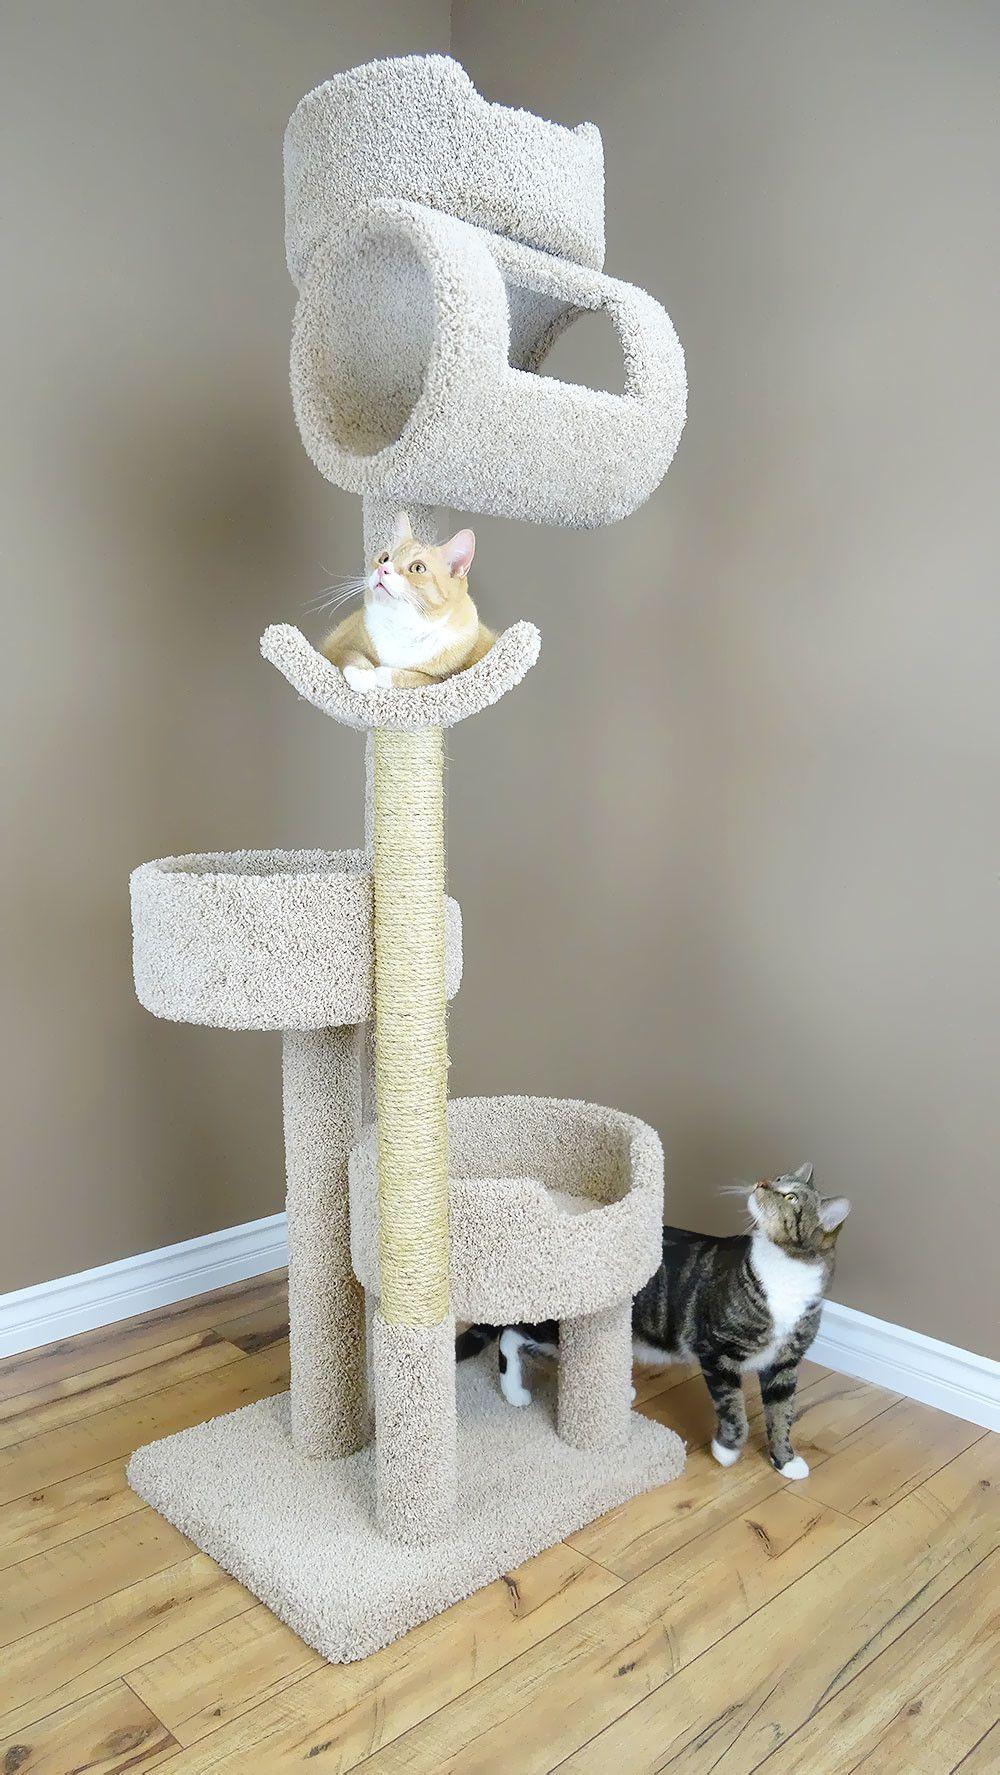 67 Quot Premier Twin Tower Cat Tree